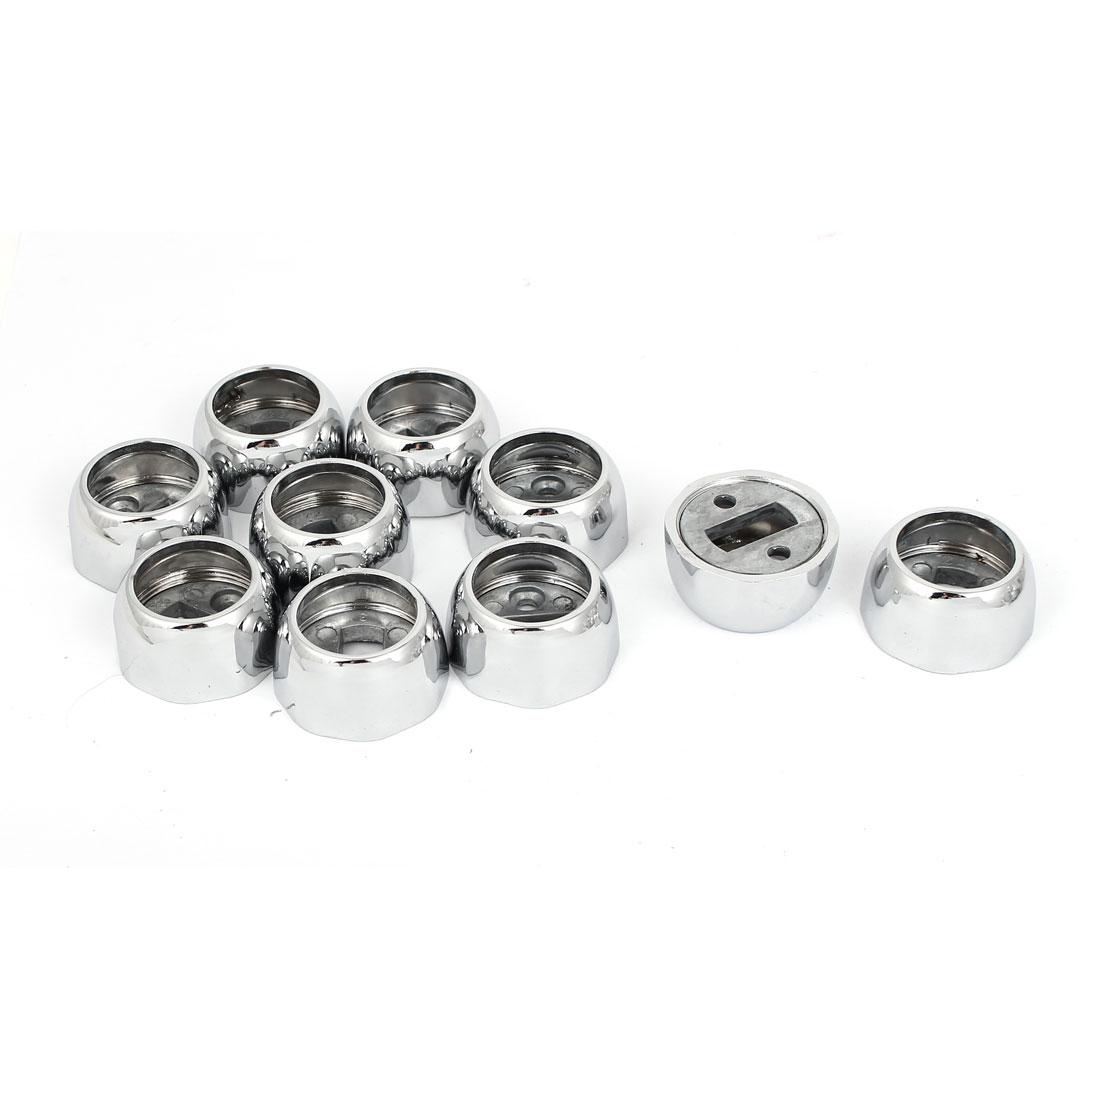 25mm Dia Alloy Closet Rod Flange Octagonal Socket Holder Bracket 20pcs